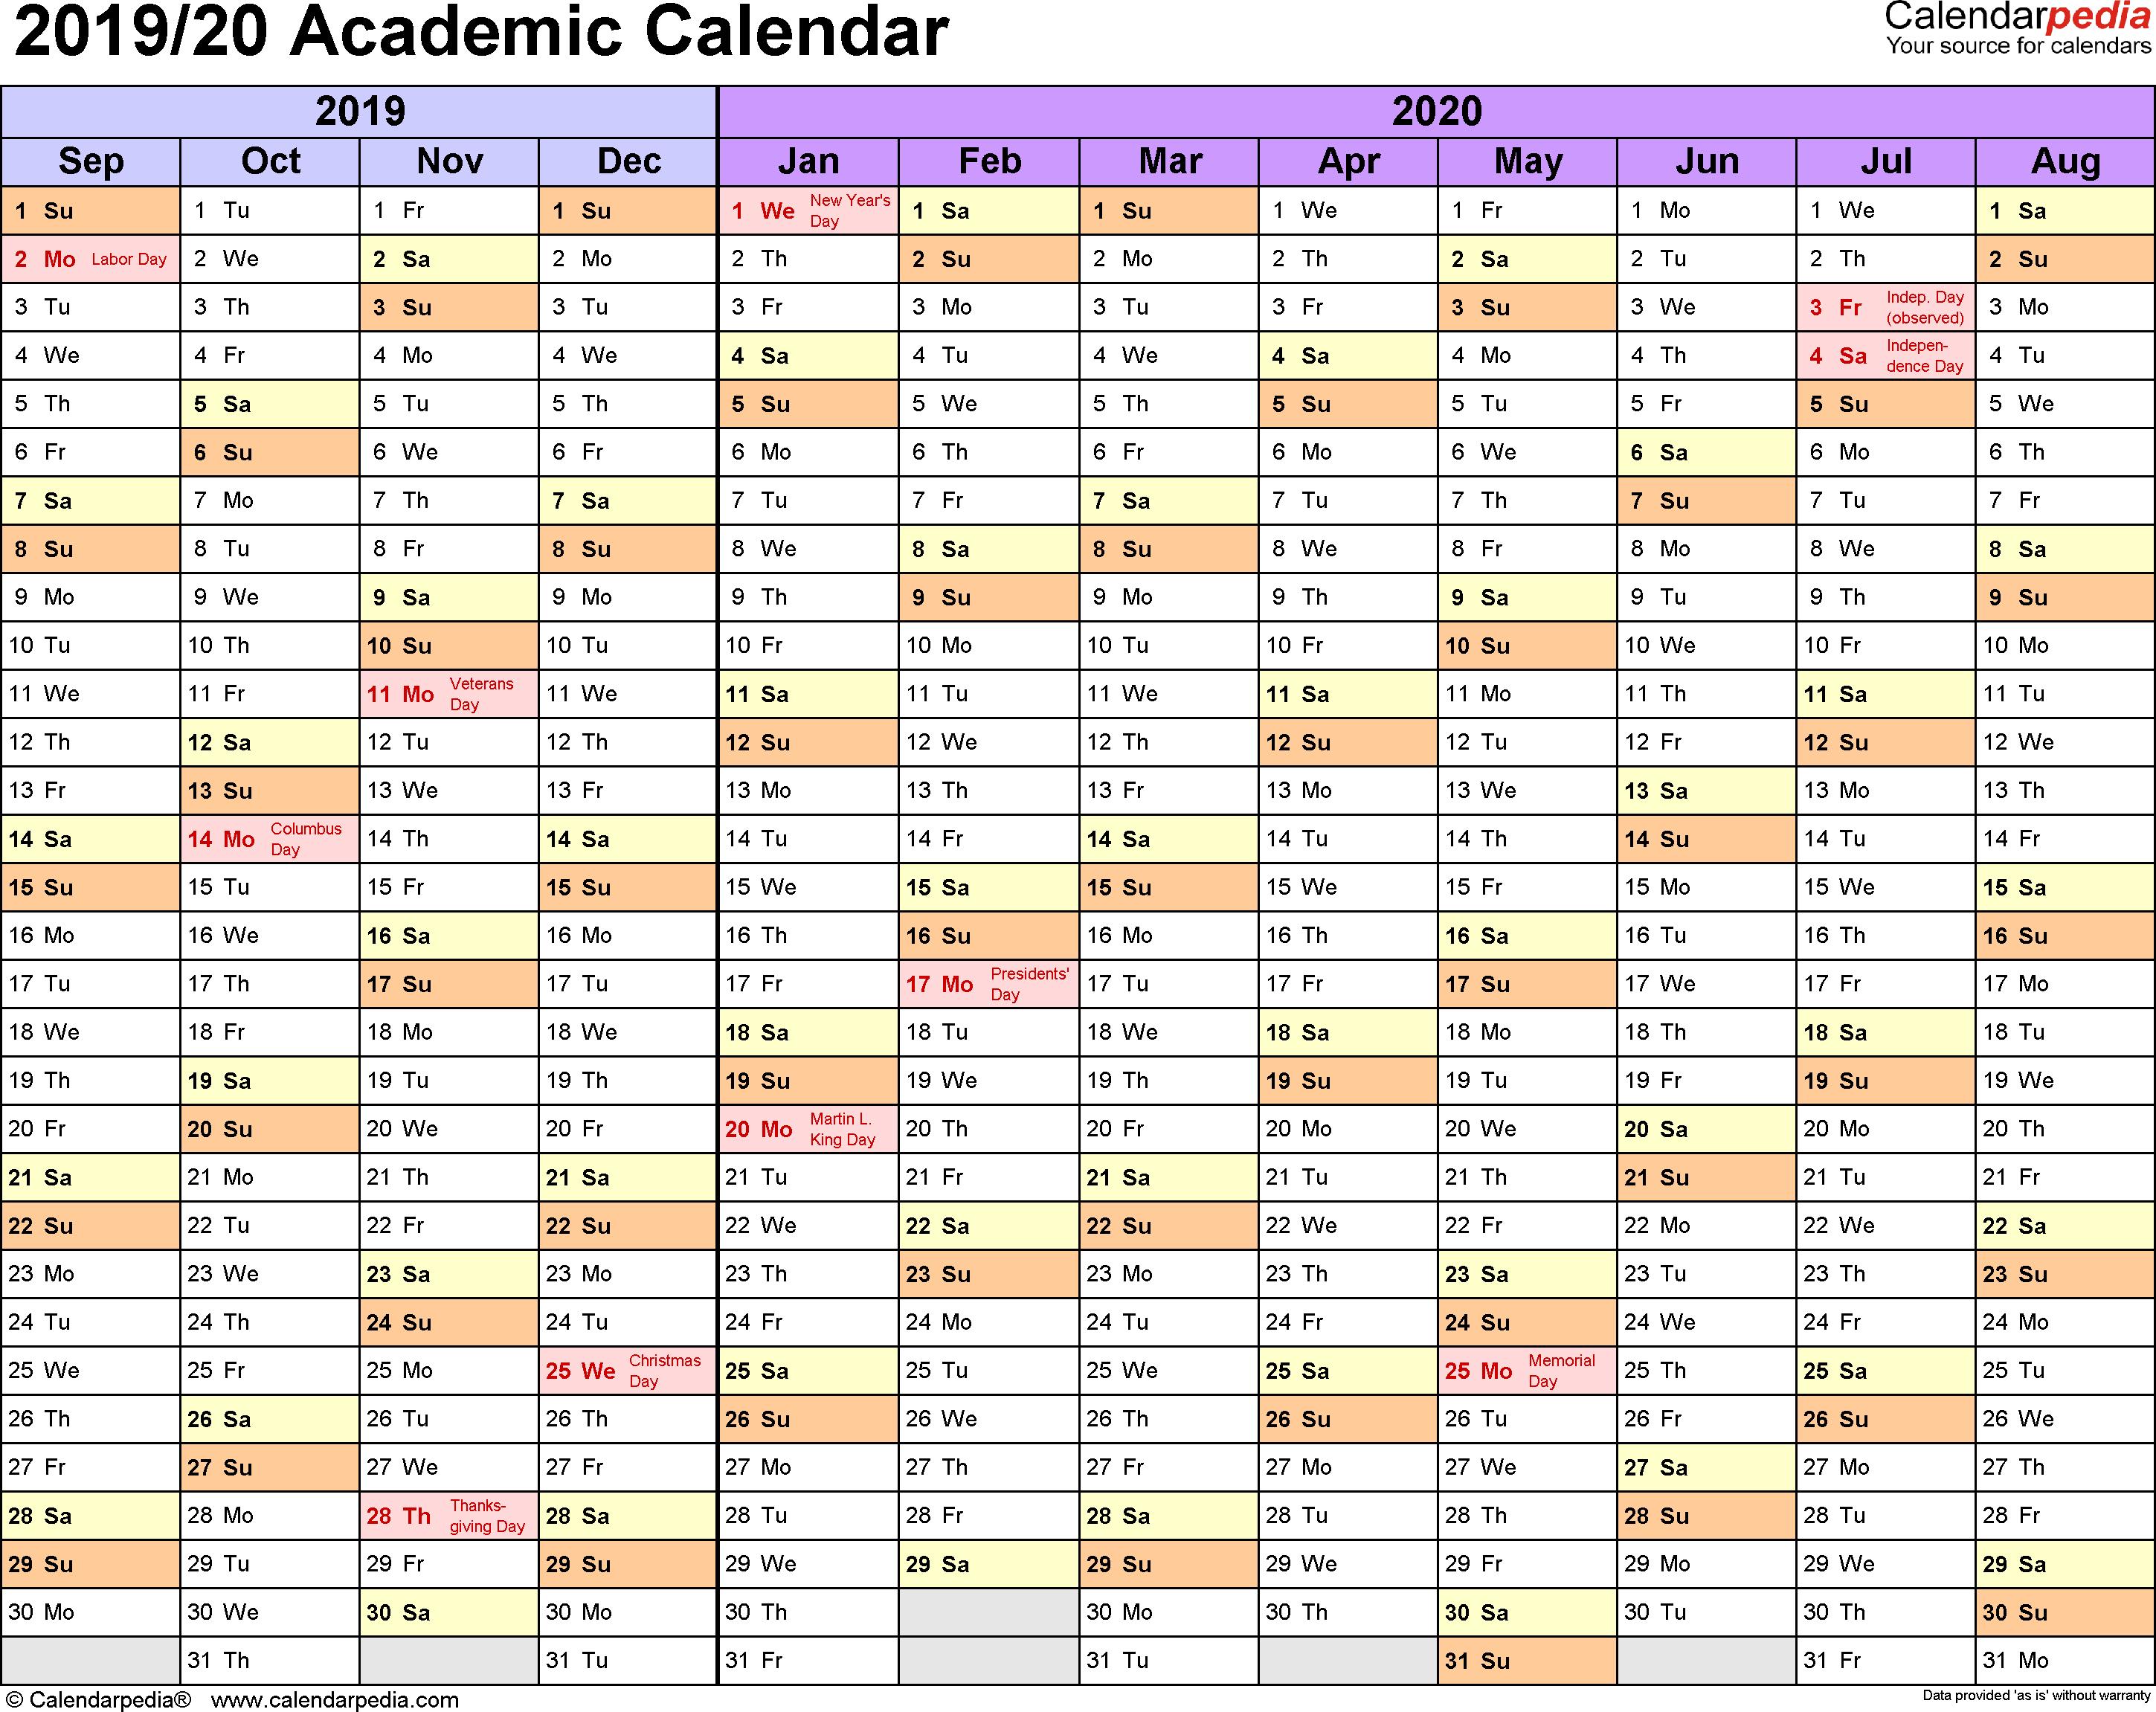 Academic Calendars 2019/2020 - Free Printable Excel Templates inside Calendar 2019 2020 Free Download